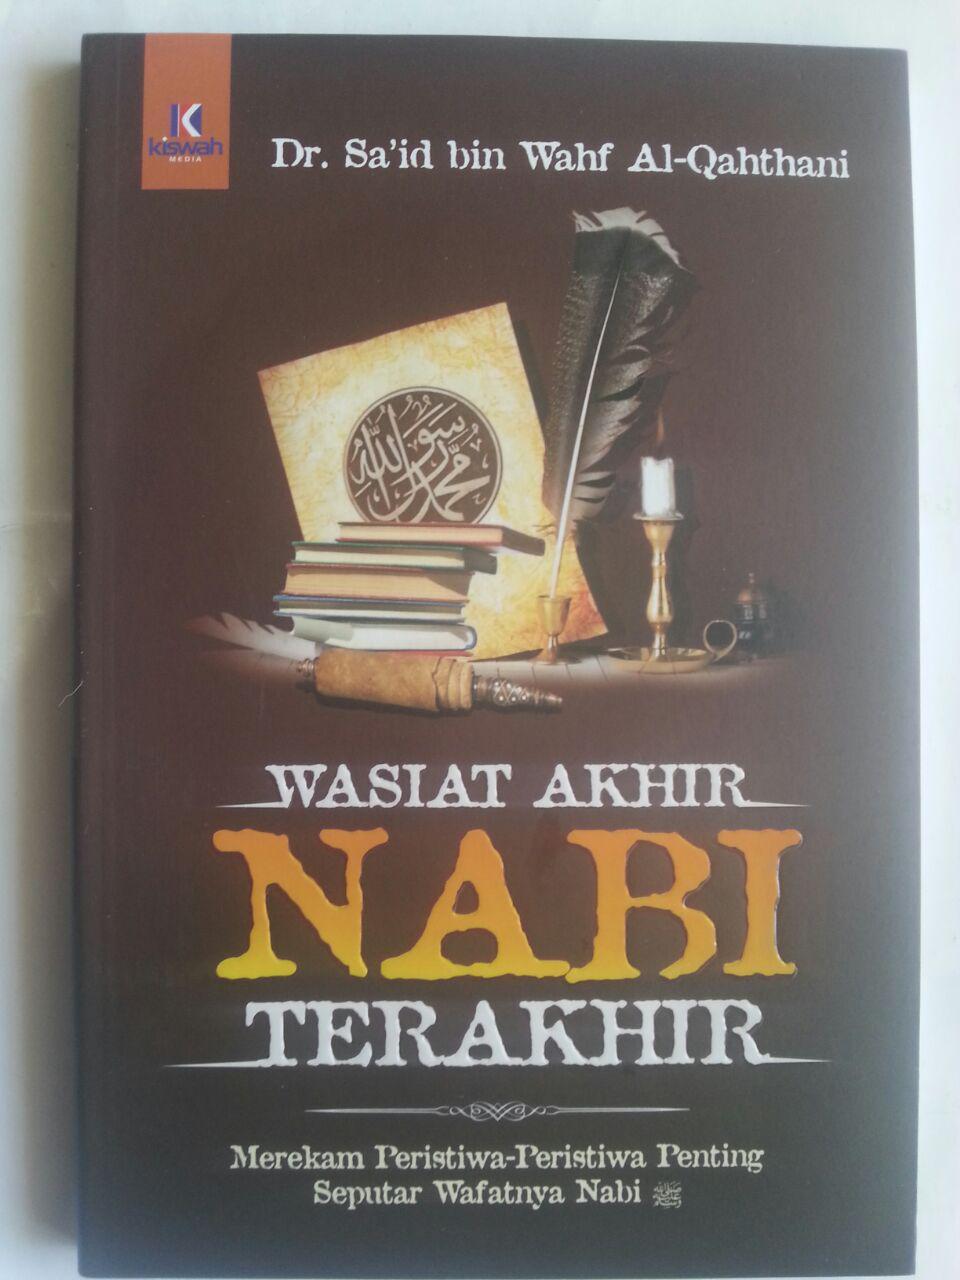 Buku Wasiat Akhir Nabi Terakhir Peristiwa Penting Seputar Wafat Nabi cover 2